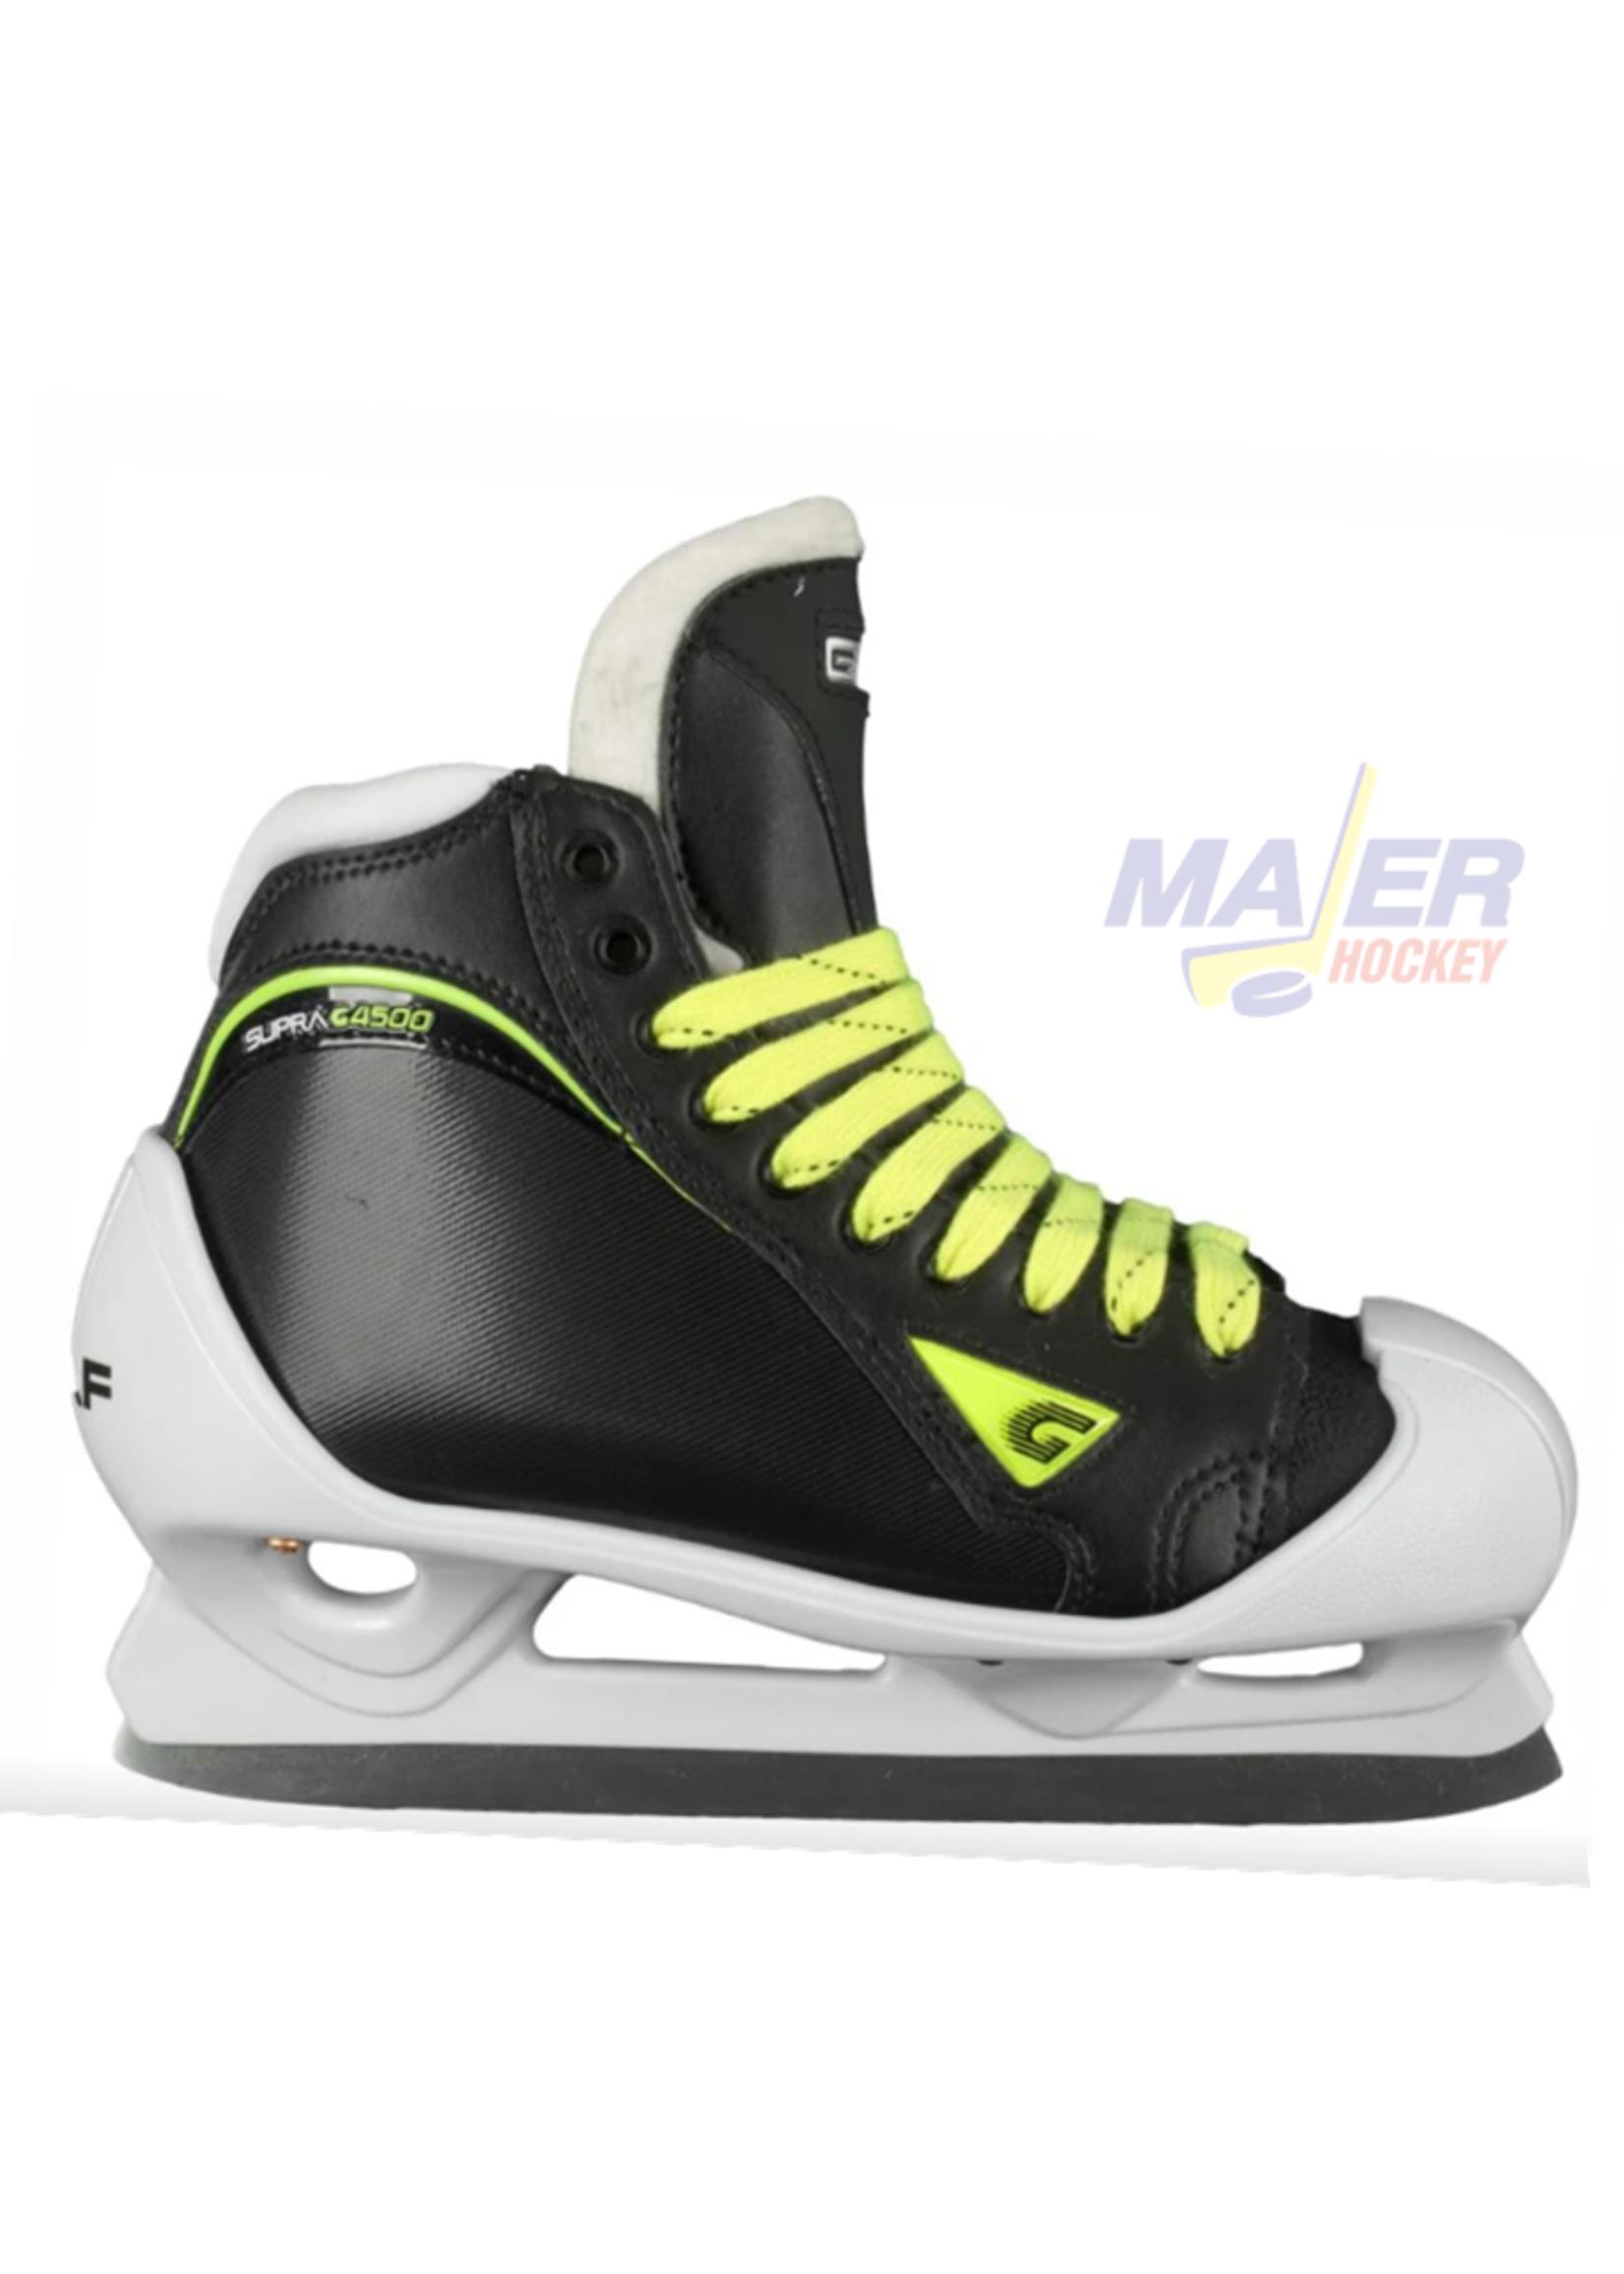 Graf Ultra G4500 Junior Goalie Skates